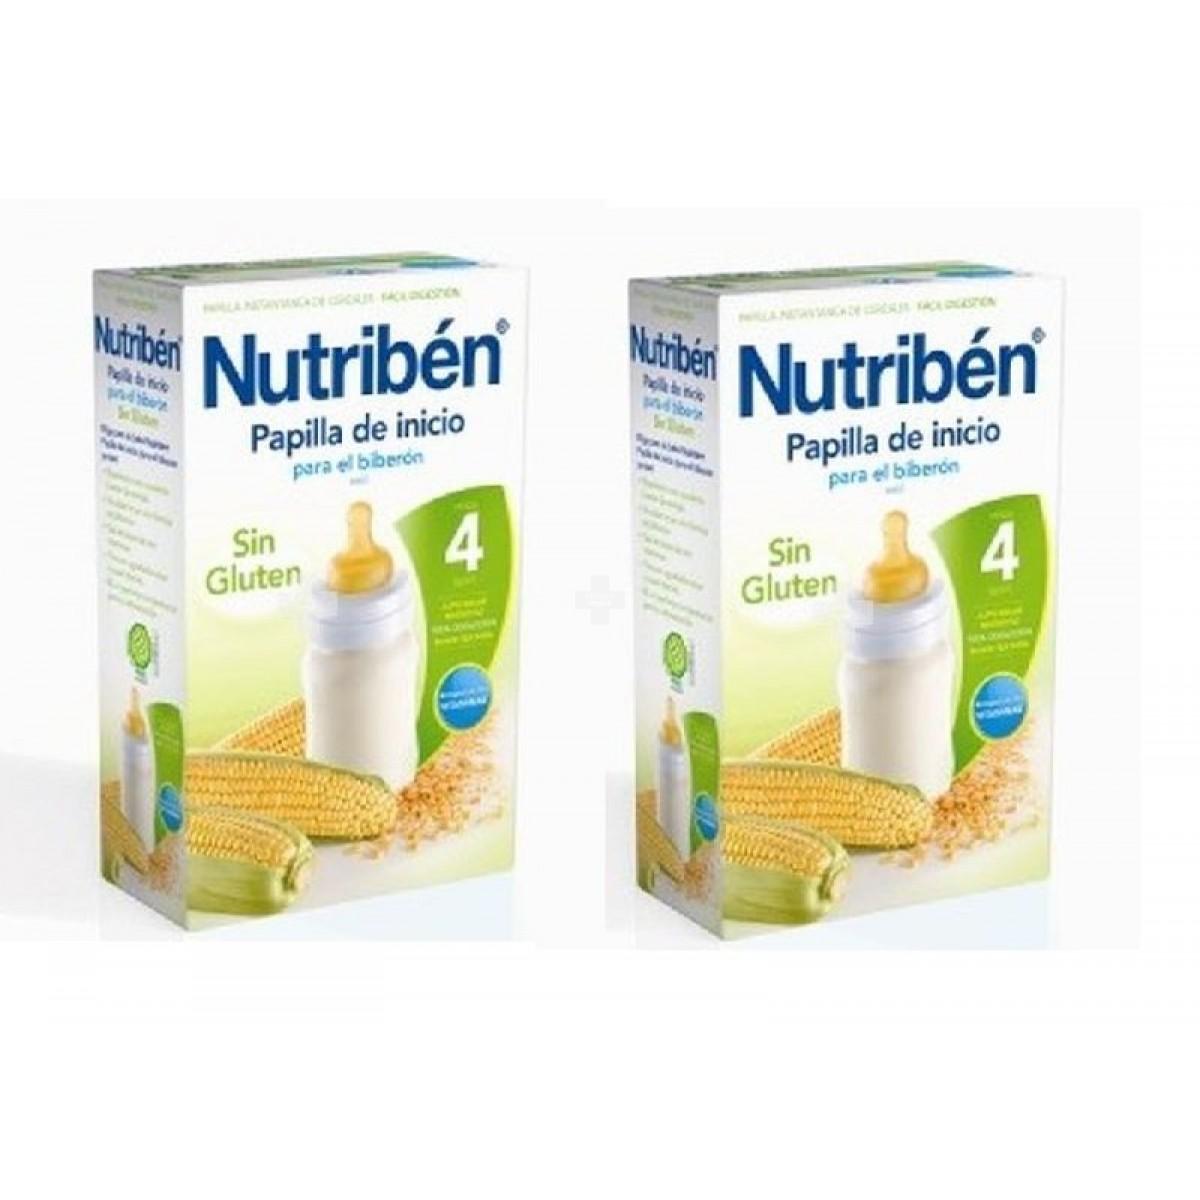 Oferta nutriben cereales sin gluten inicio biberon 2x600 g - Cereales sin gluten bebe 3 meses ...